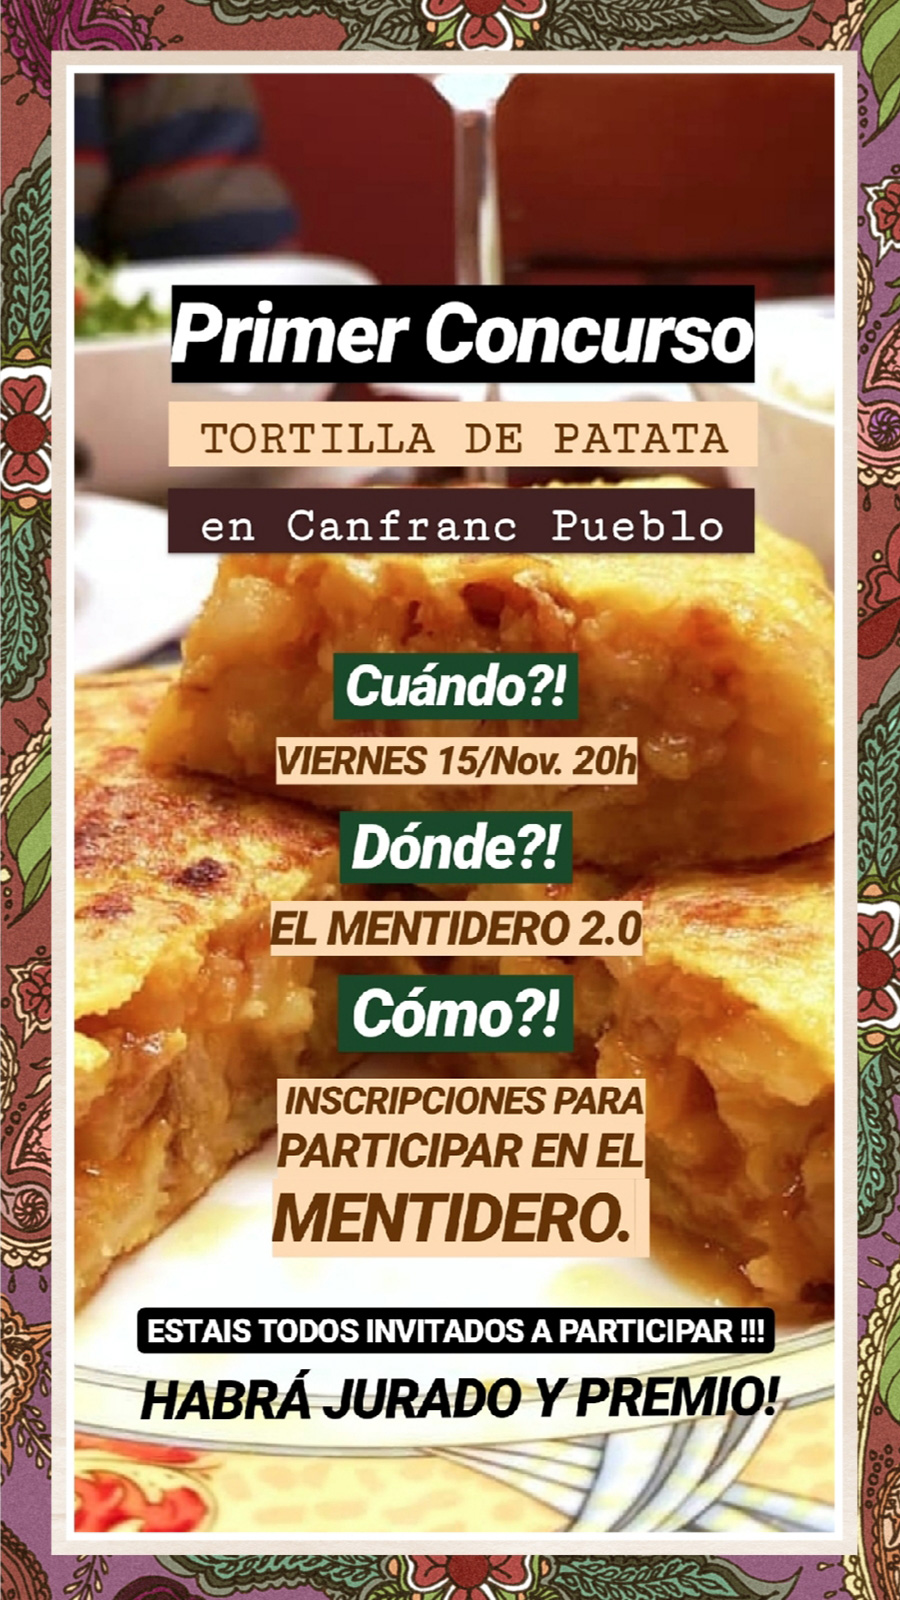 I Concurso Tortilla de Patata